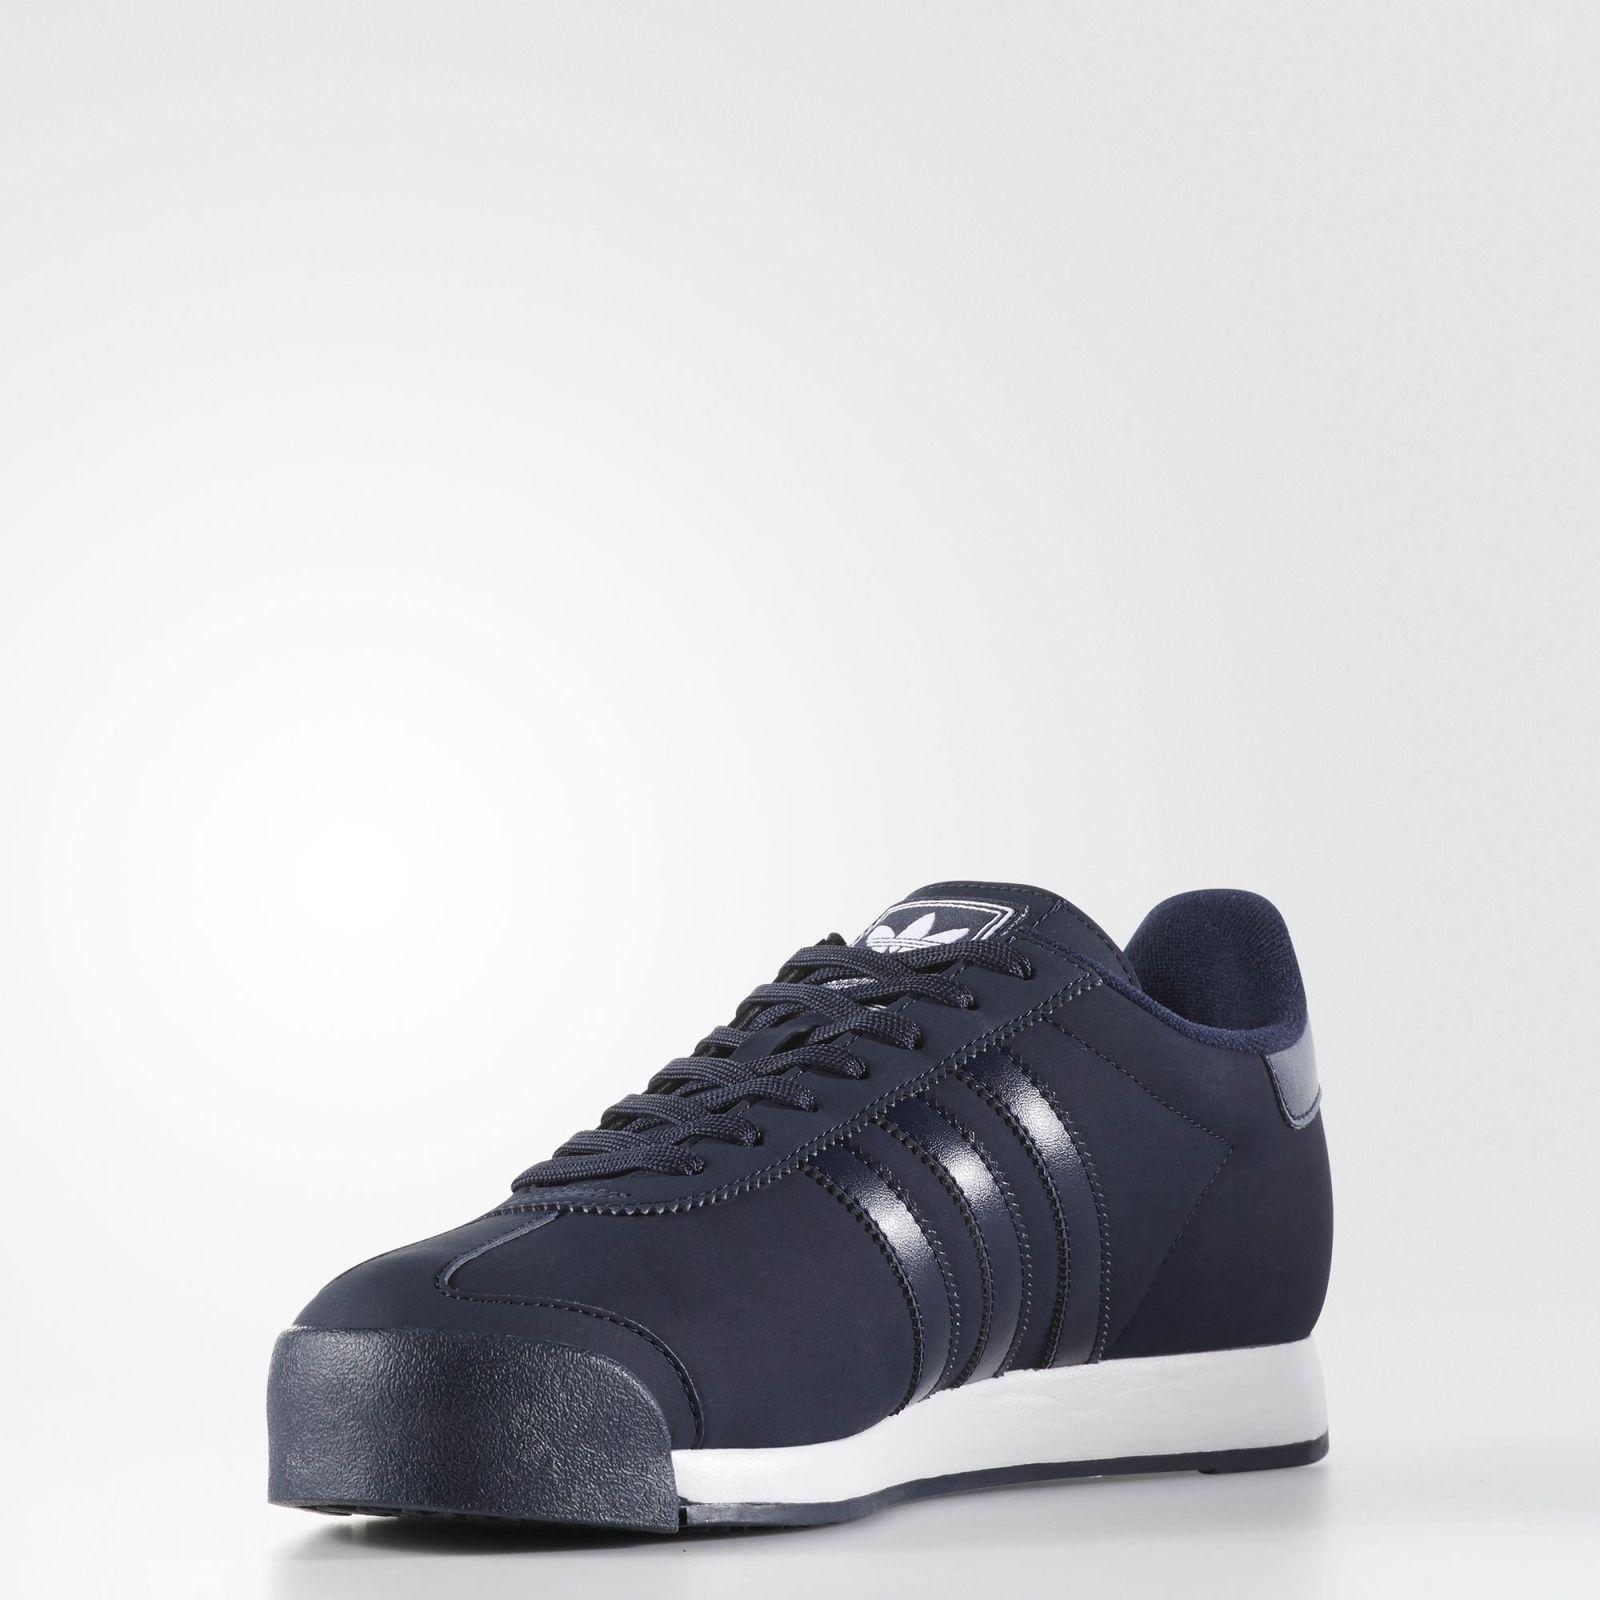 adidas Samoa Shoes Men's 60% Off w/ FREE SHIPPING $29.99